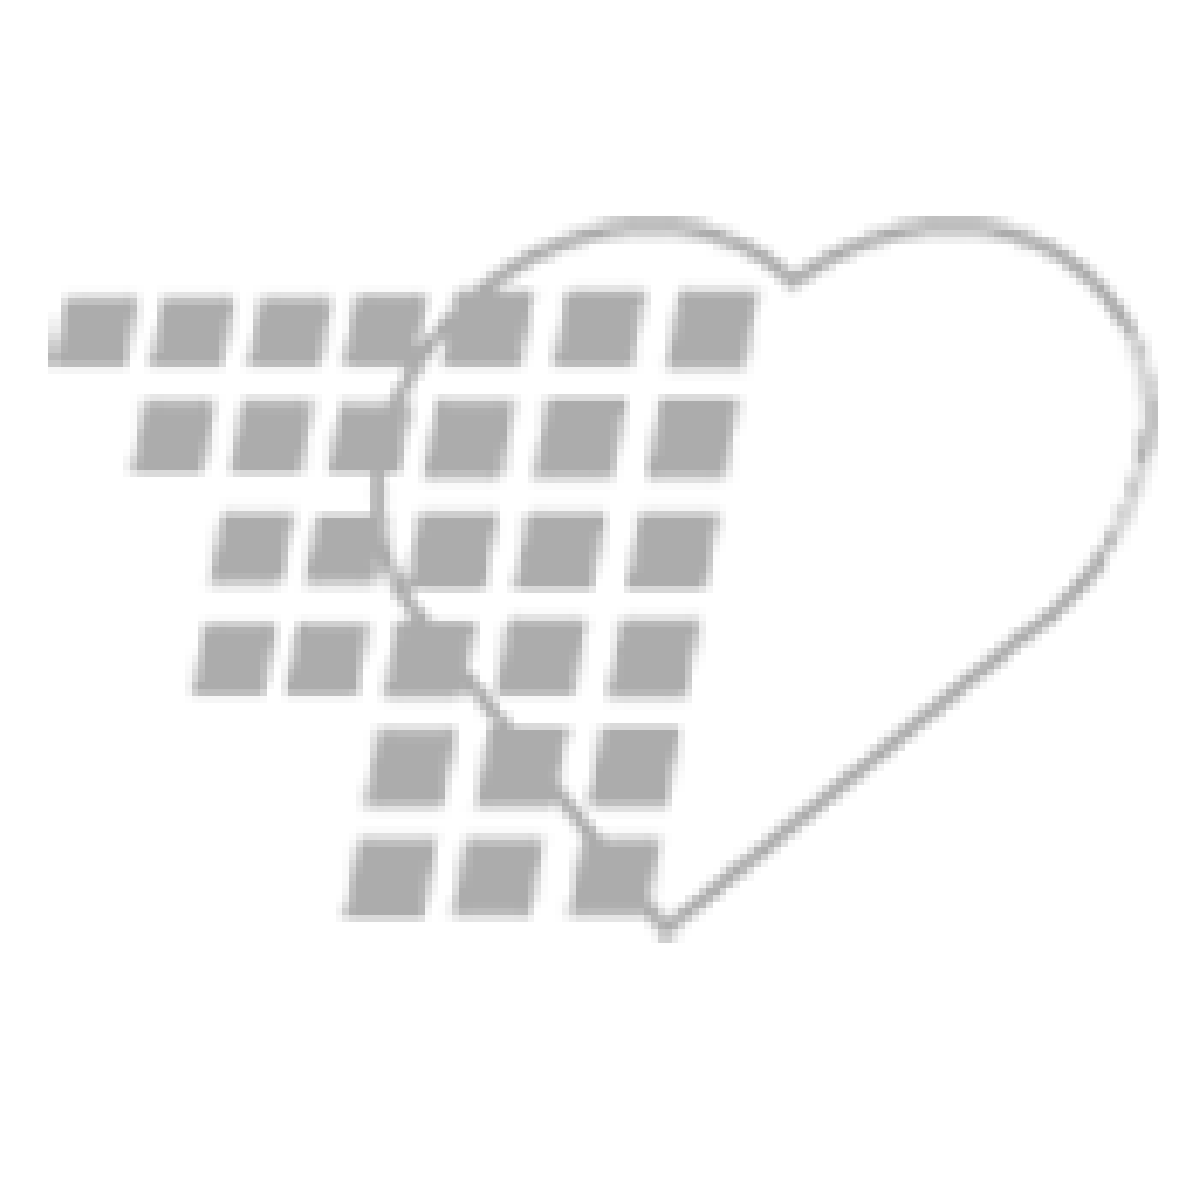 06-93-1155 - Demo Dose® Dextros 50% 50mL